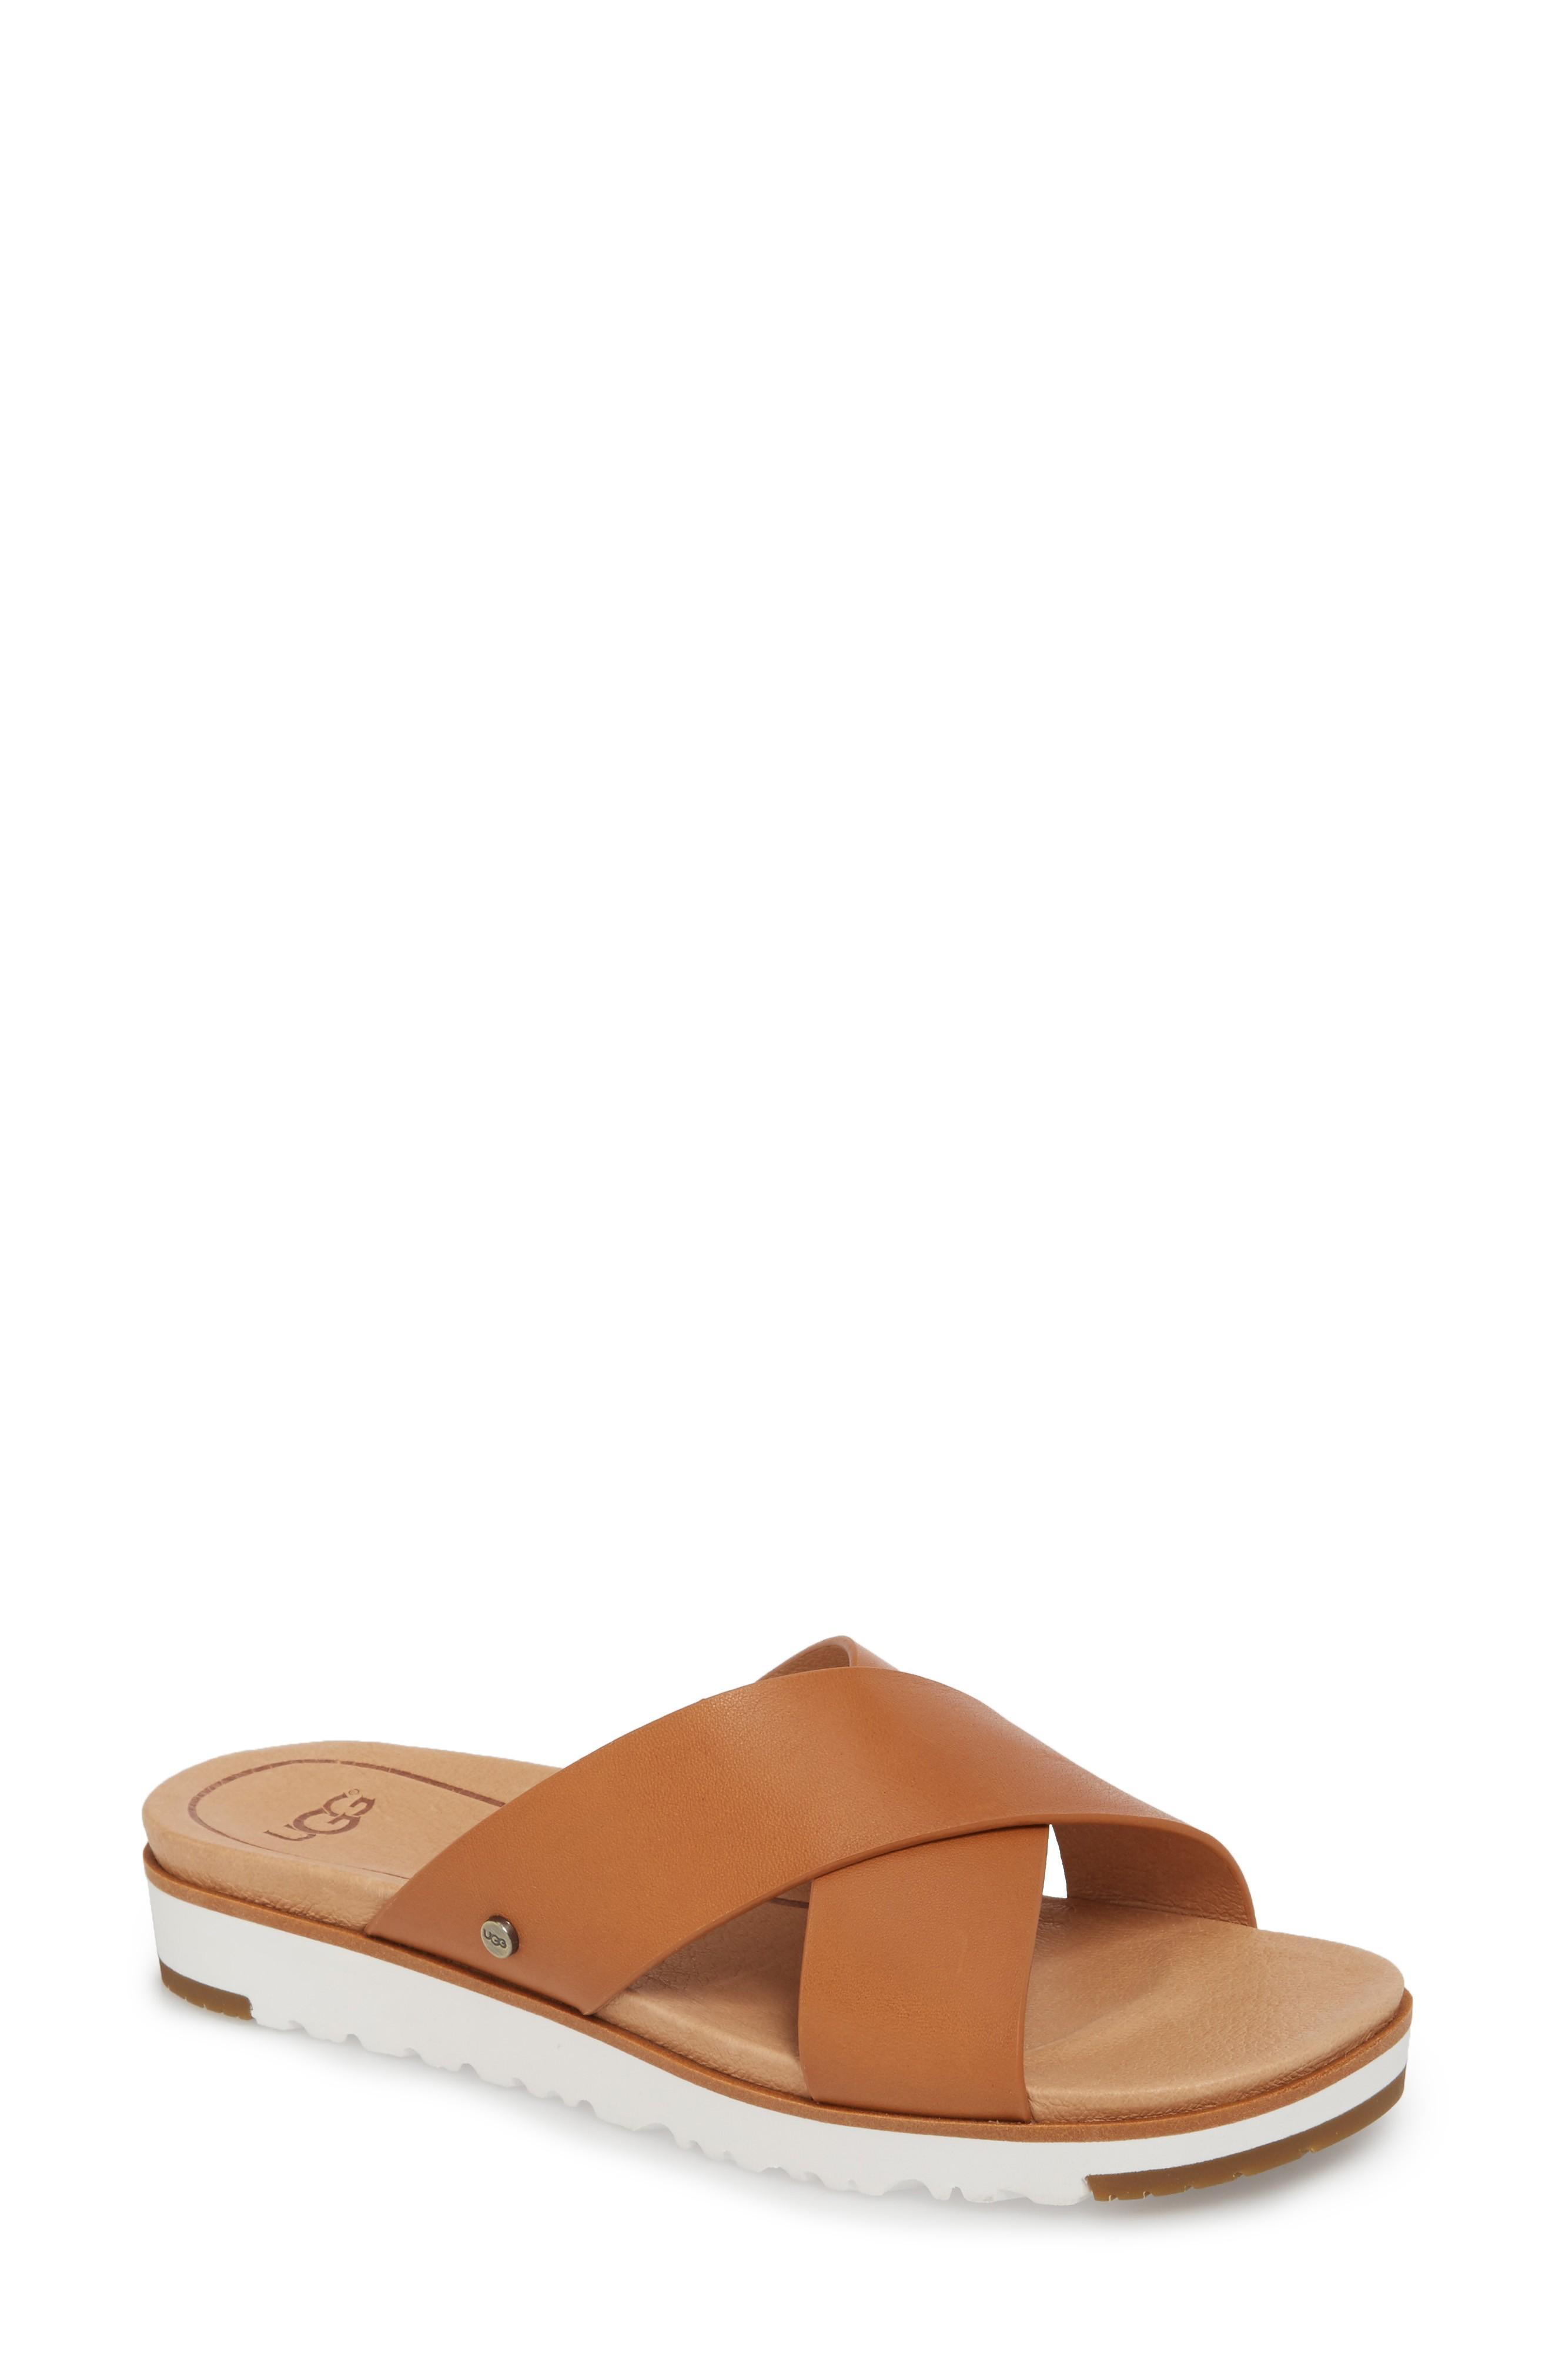 502b520c8e2 Women's Kari Leather Platform Slide Sandals in Natural